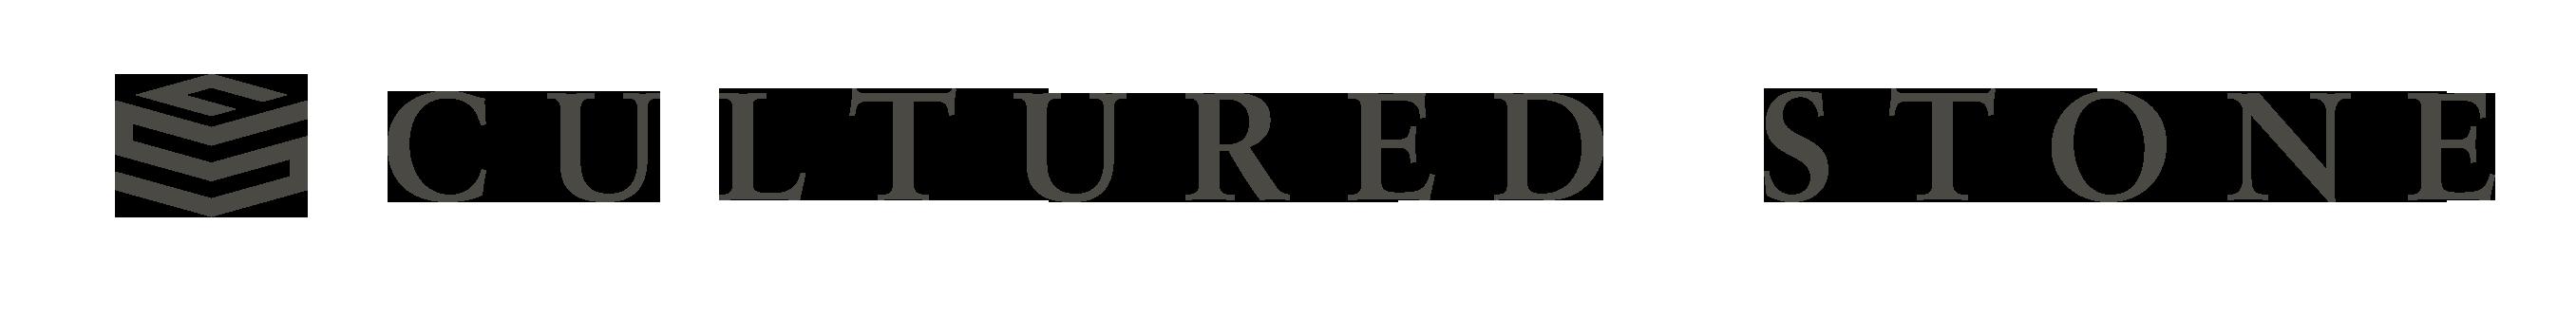 Cultured-Stone-Logotype-W-Mark-Dark